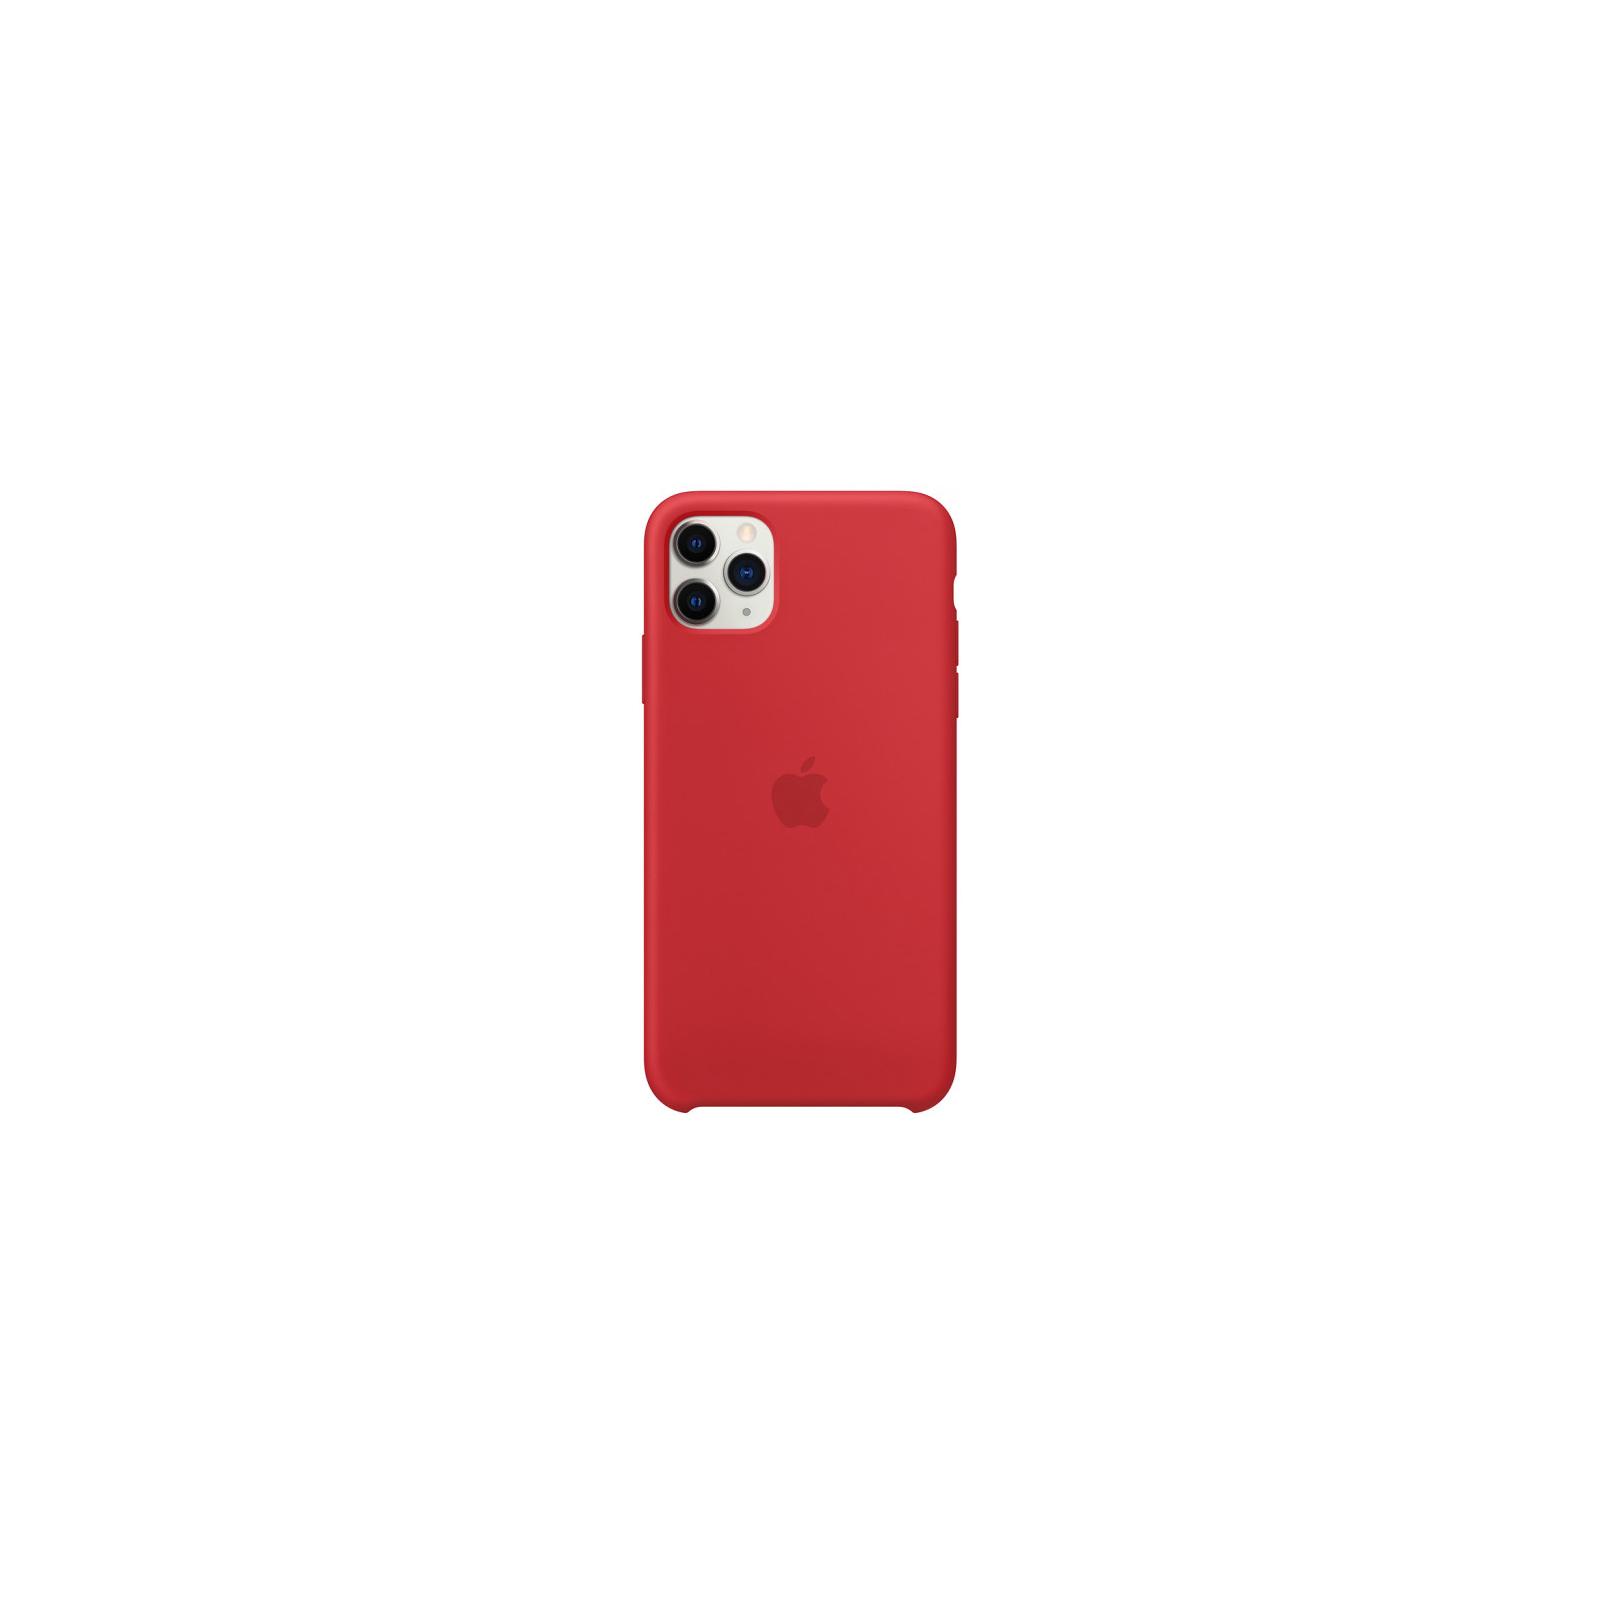 Чехол для моб. телефона Apple iPhone 11 Pro Max Silicone Case - Pine Green (MX012ZM/A) изображение 2